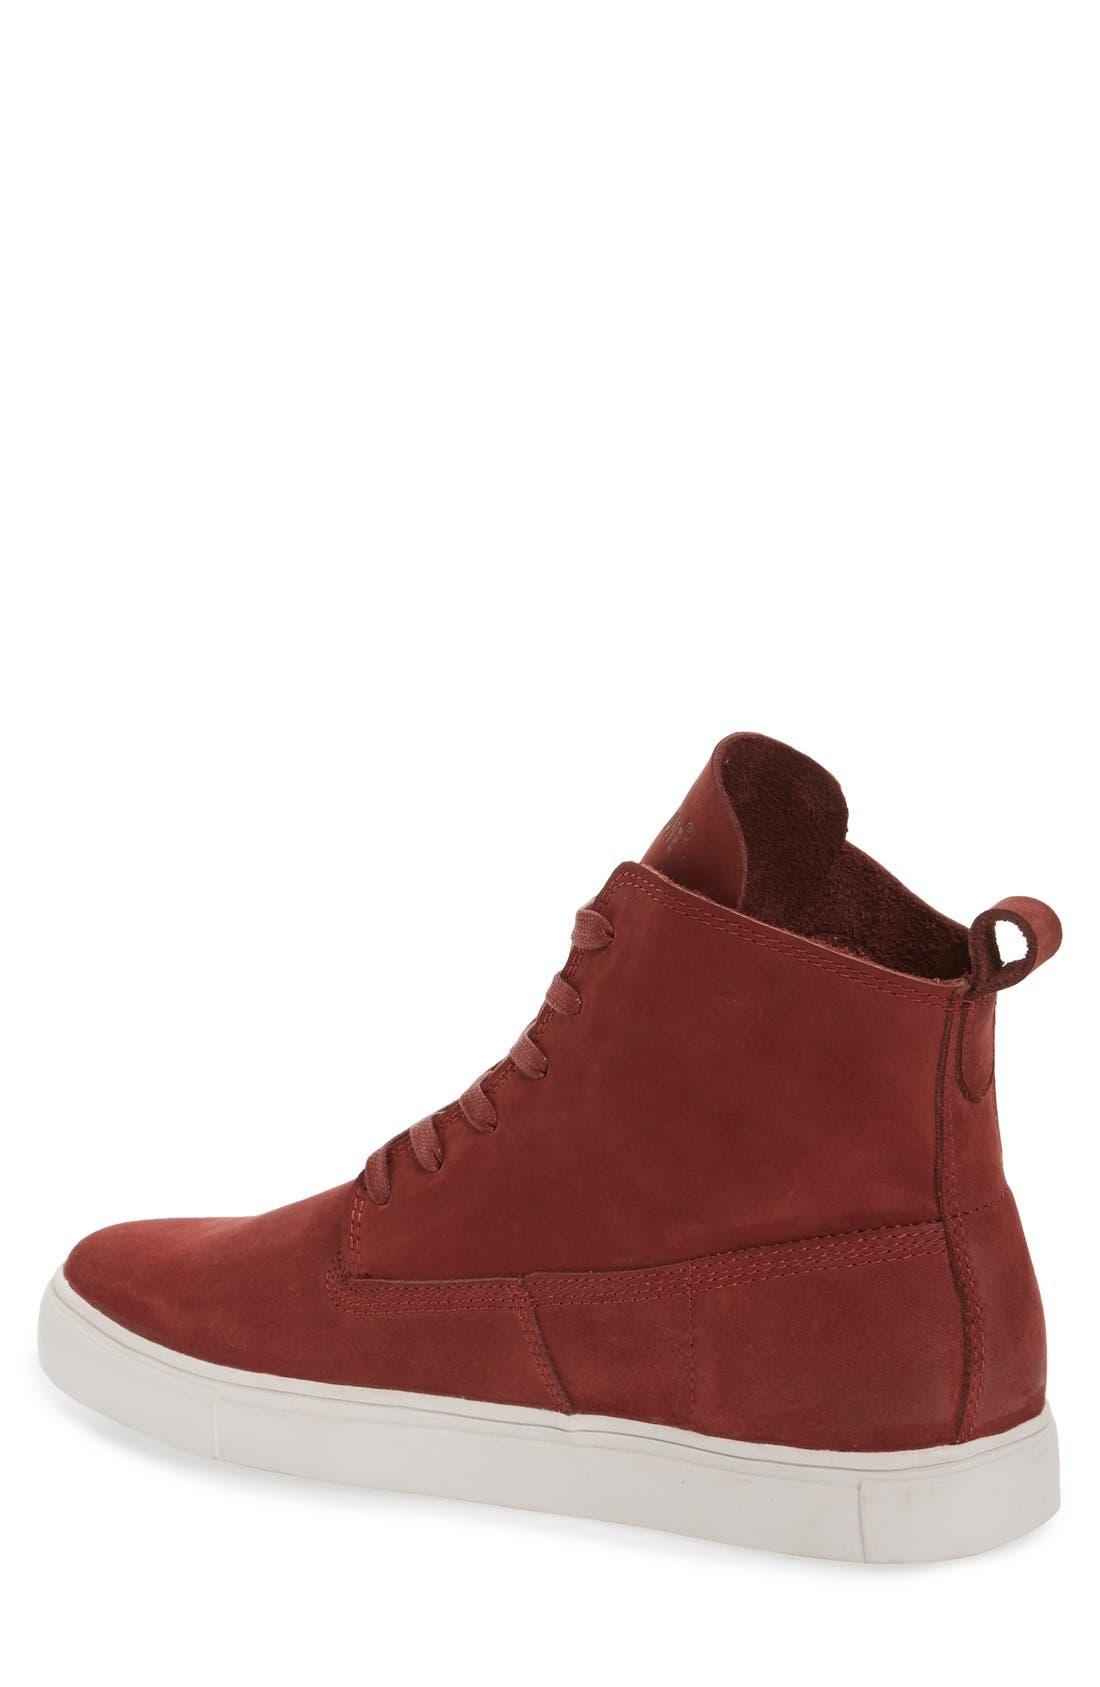 'MM33' High Top Sneaker,                             Alternate thumbnail 2, color,                             Port